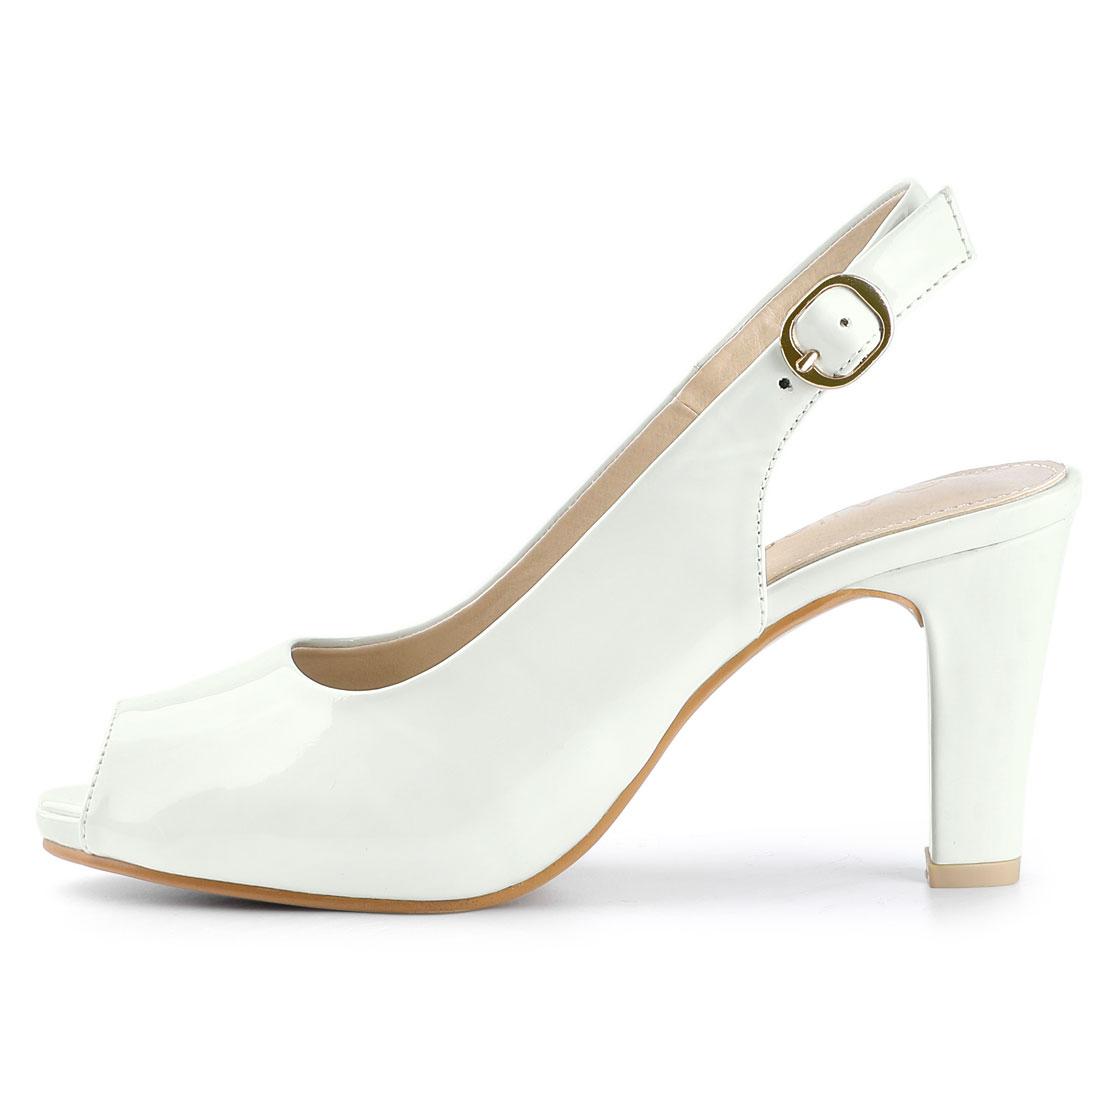 Women's Peep Toe Chunky Heel Slingback Pumps White US 8.5/UK 6.5/EU 40 - image 1 de 7